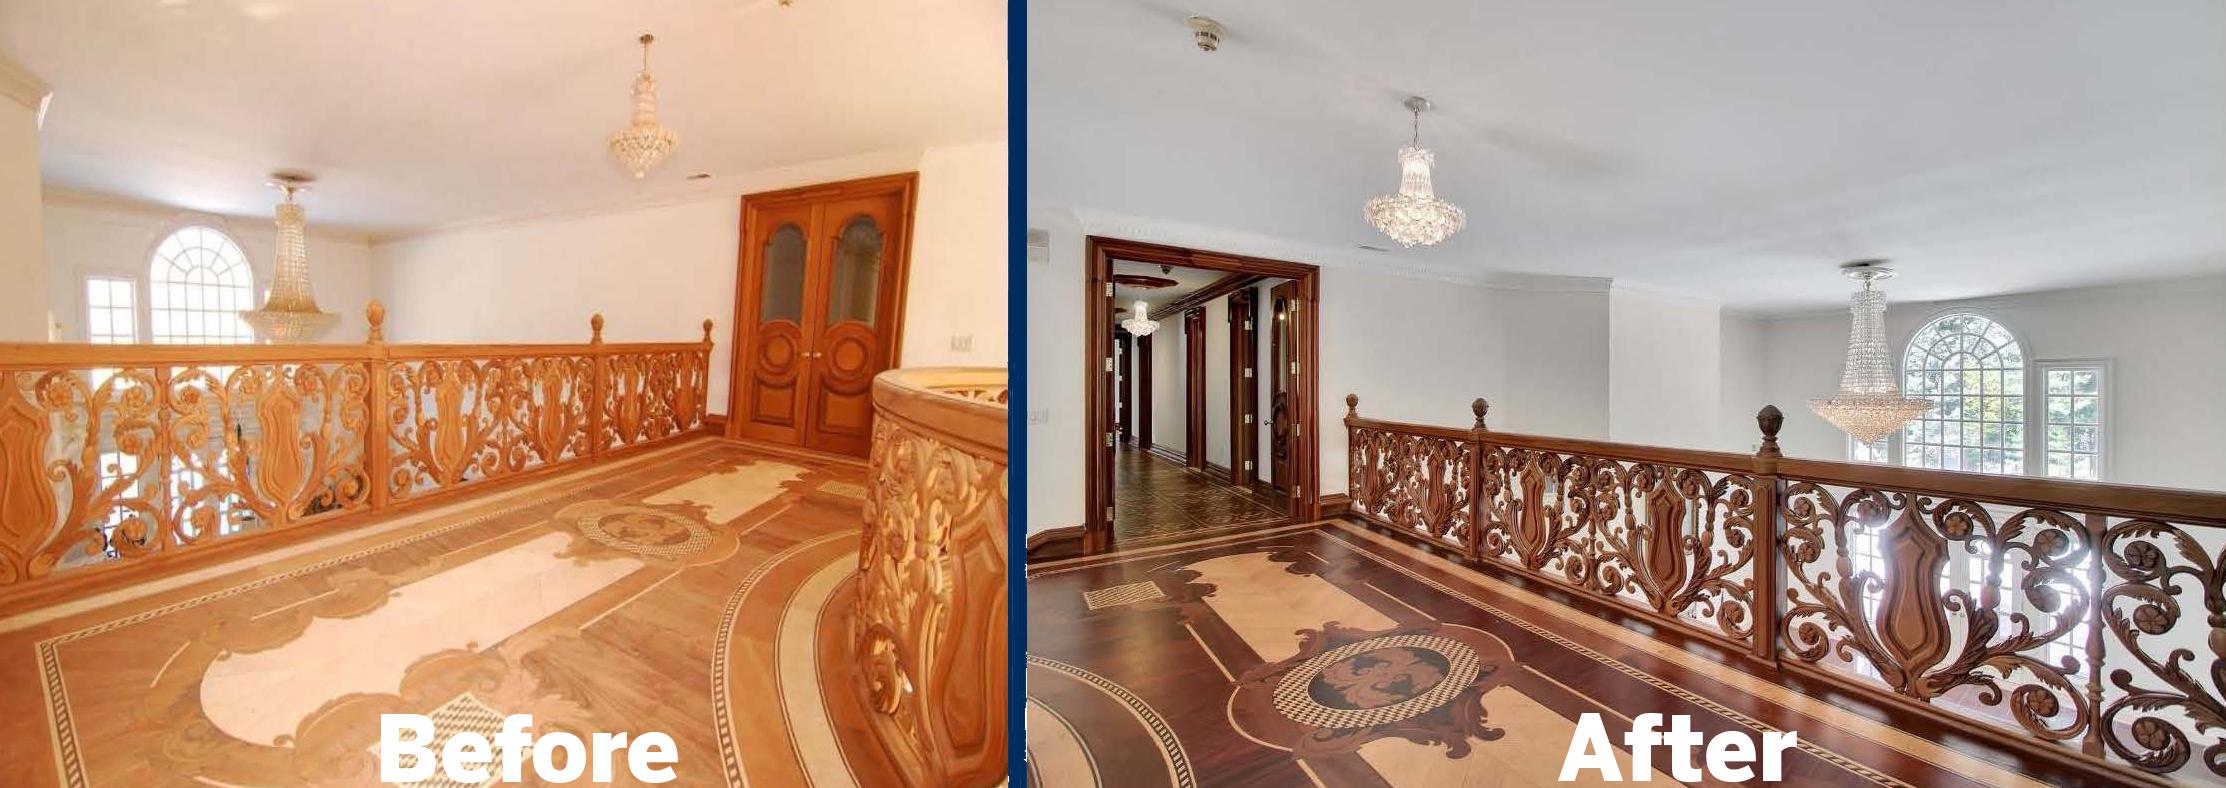 Second Floor Hallway Before & After